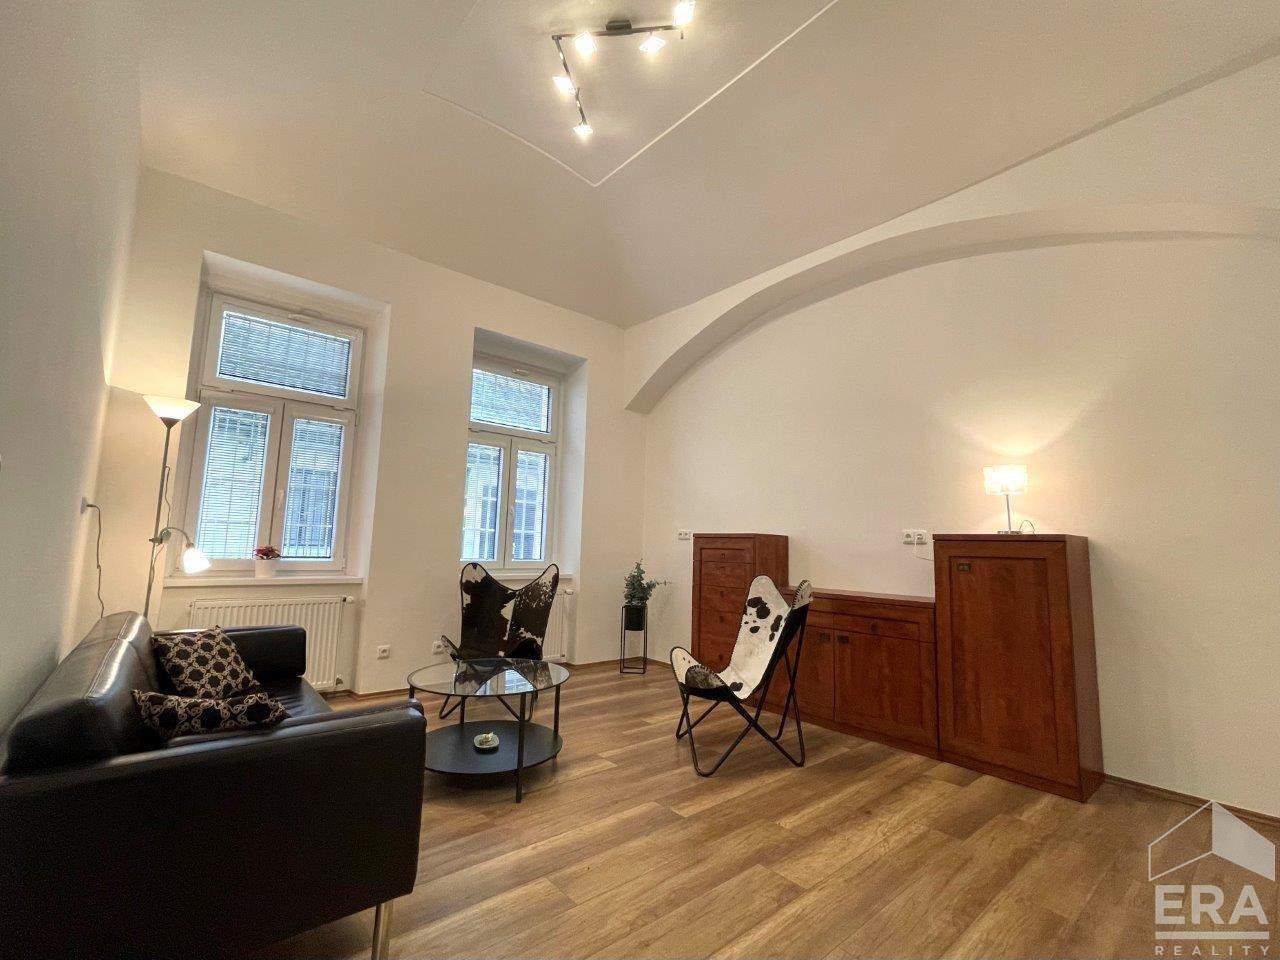 Pronájem bytu 4+1 s terasou 87 m2, Radlická ul., Praha 5 – Smíchov